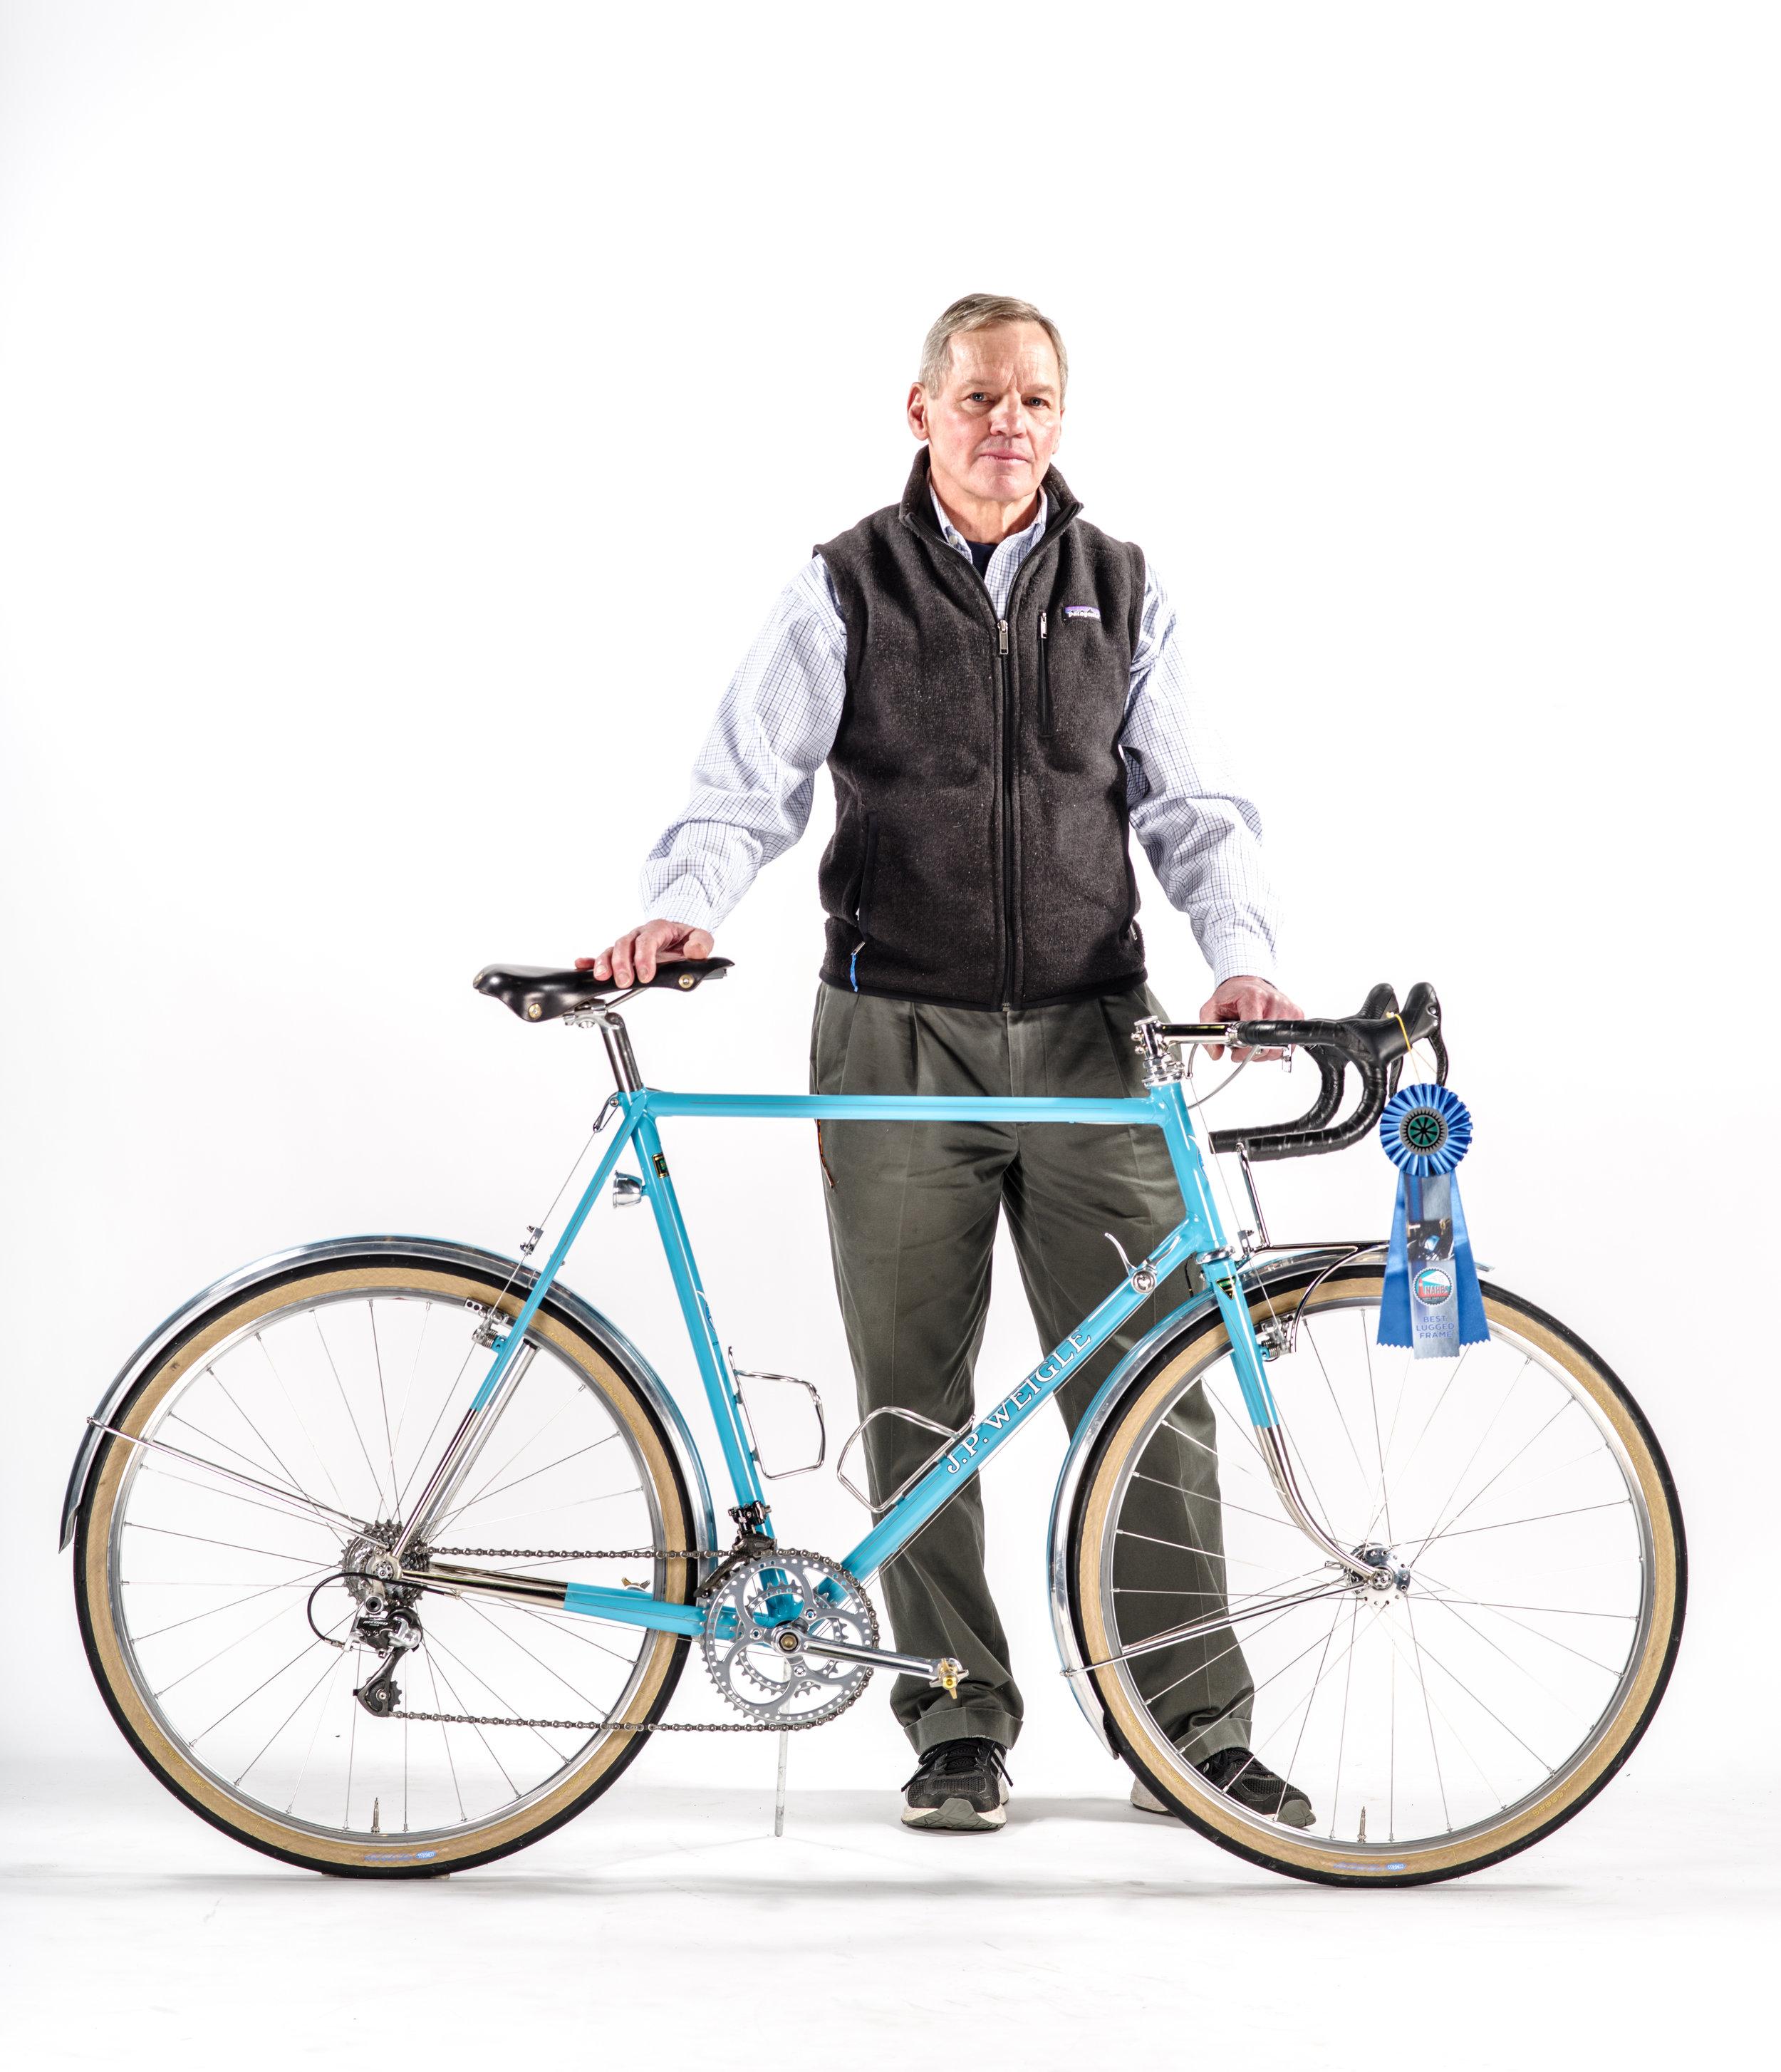 Best Lugged Frame and Best Road Bike -